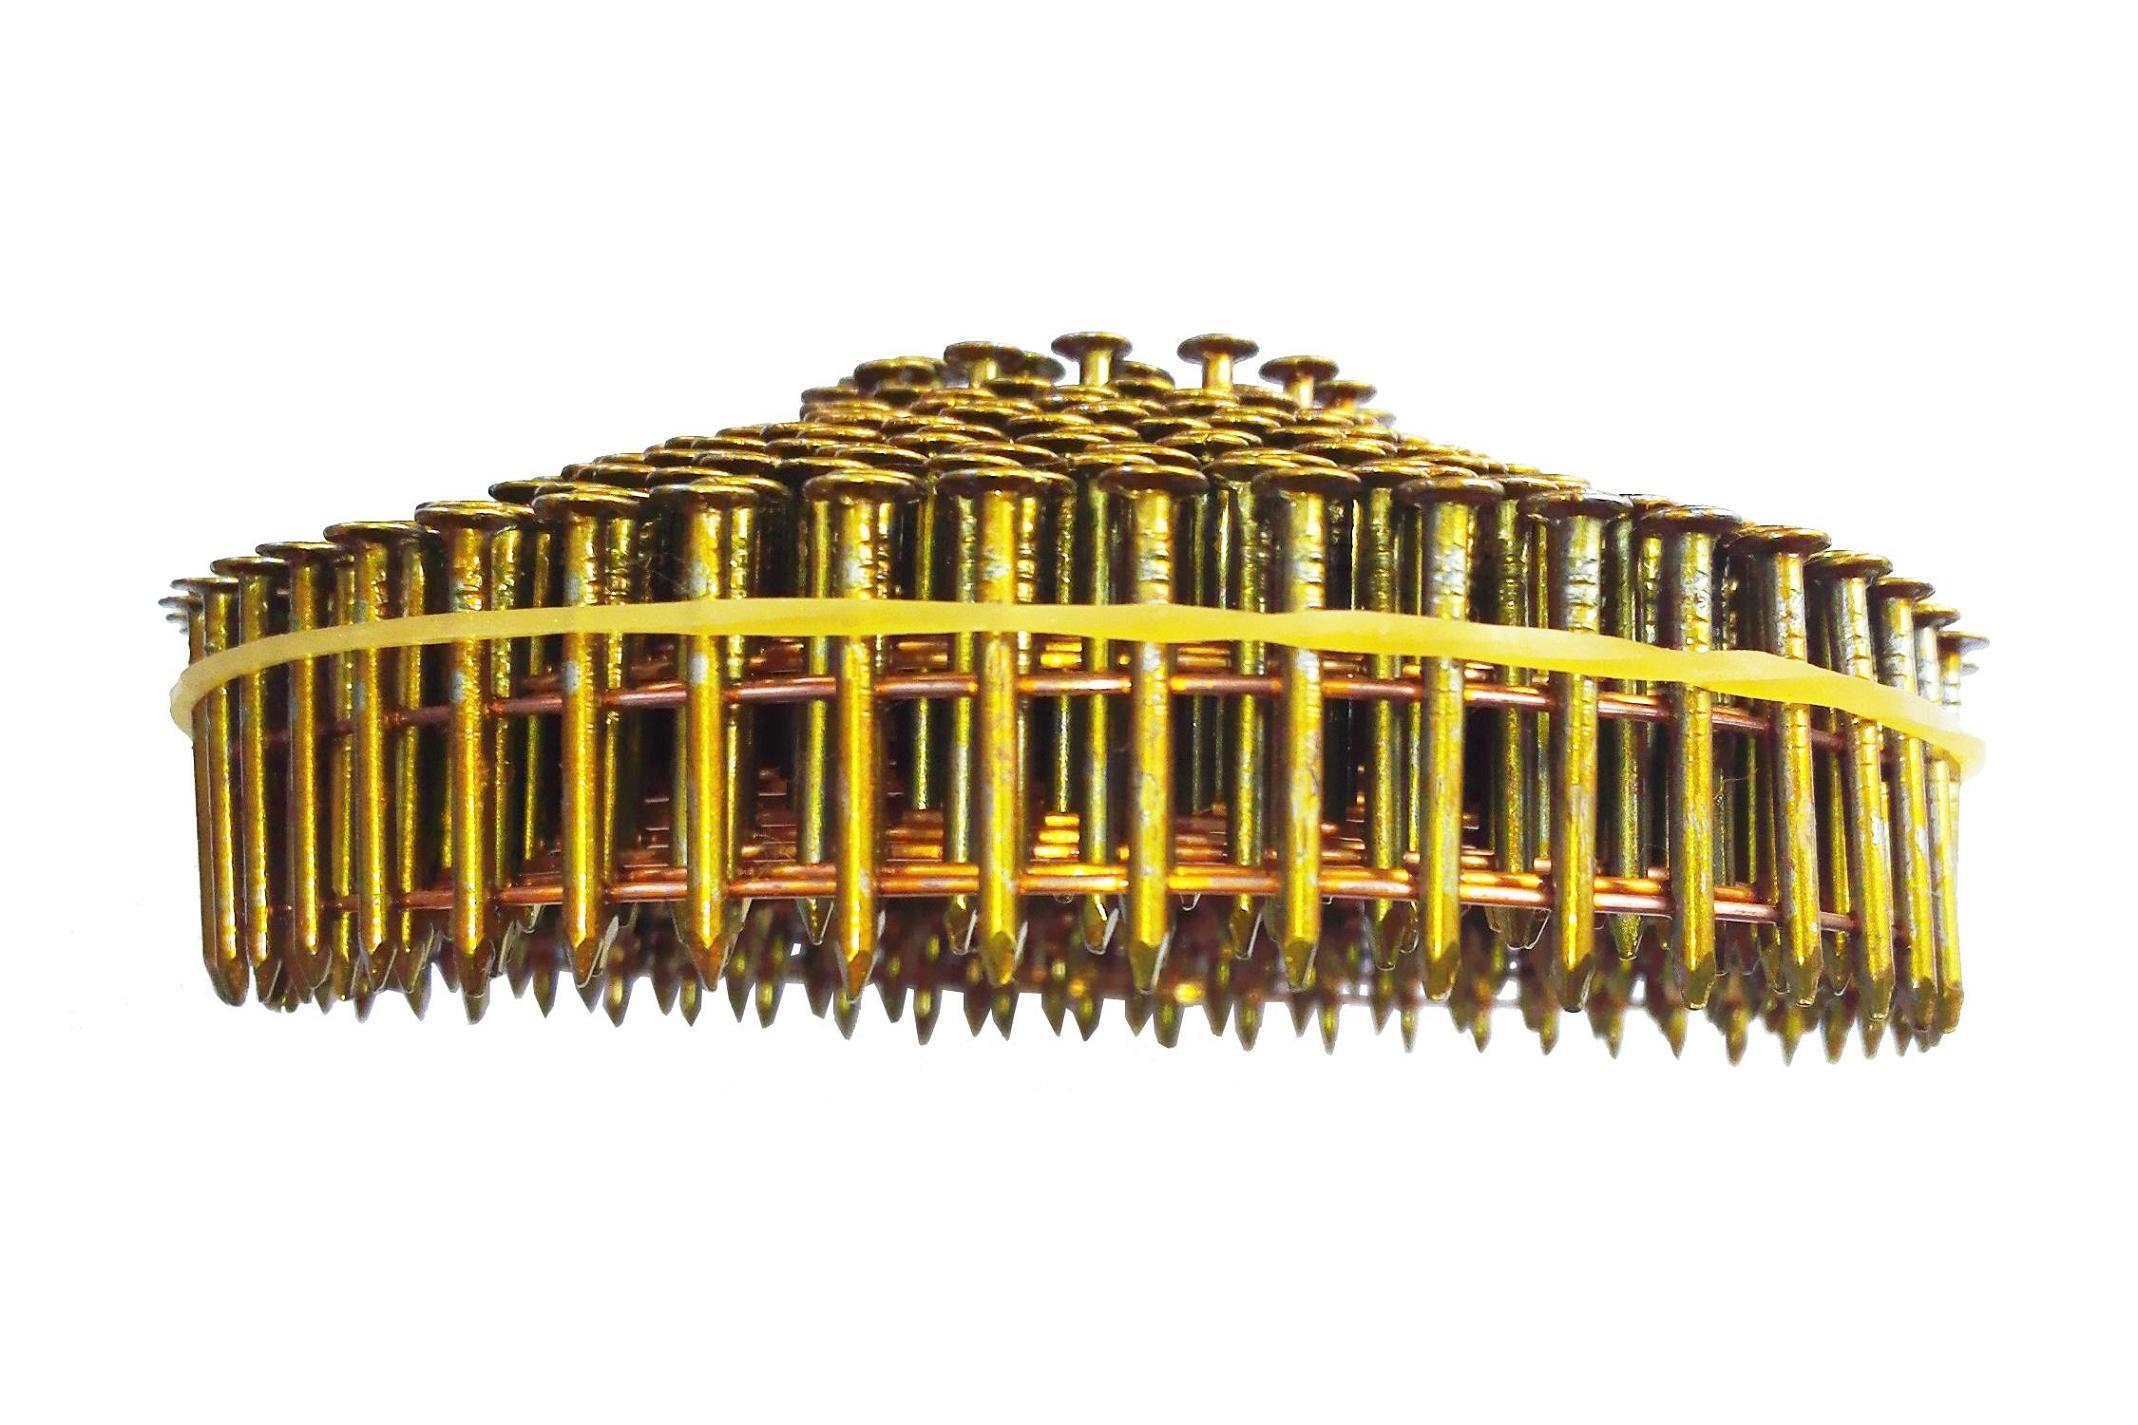 Harden, Galvanized 2.7 X 35mm Screw Shank Coil Nail